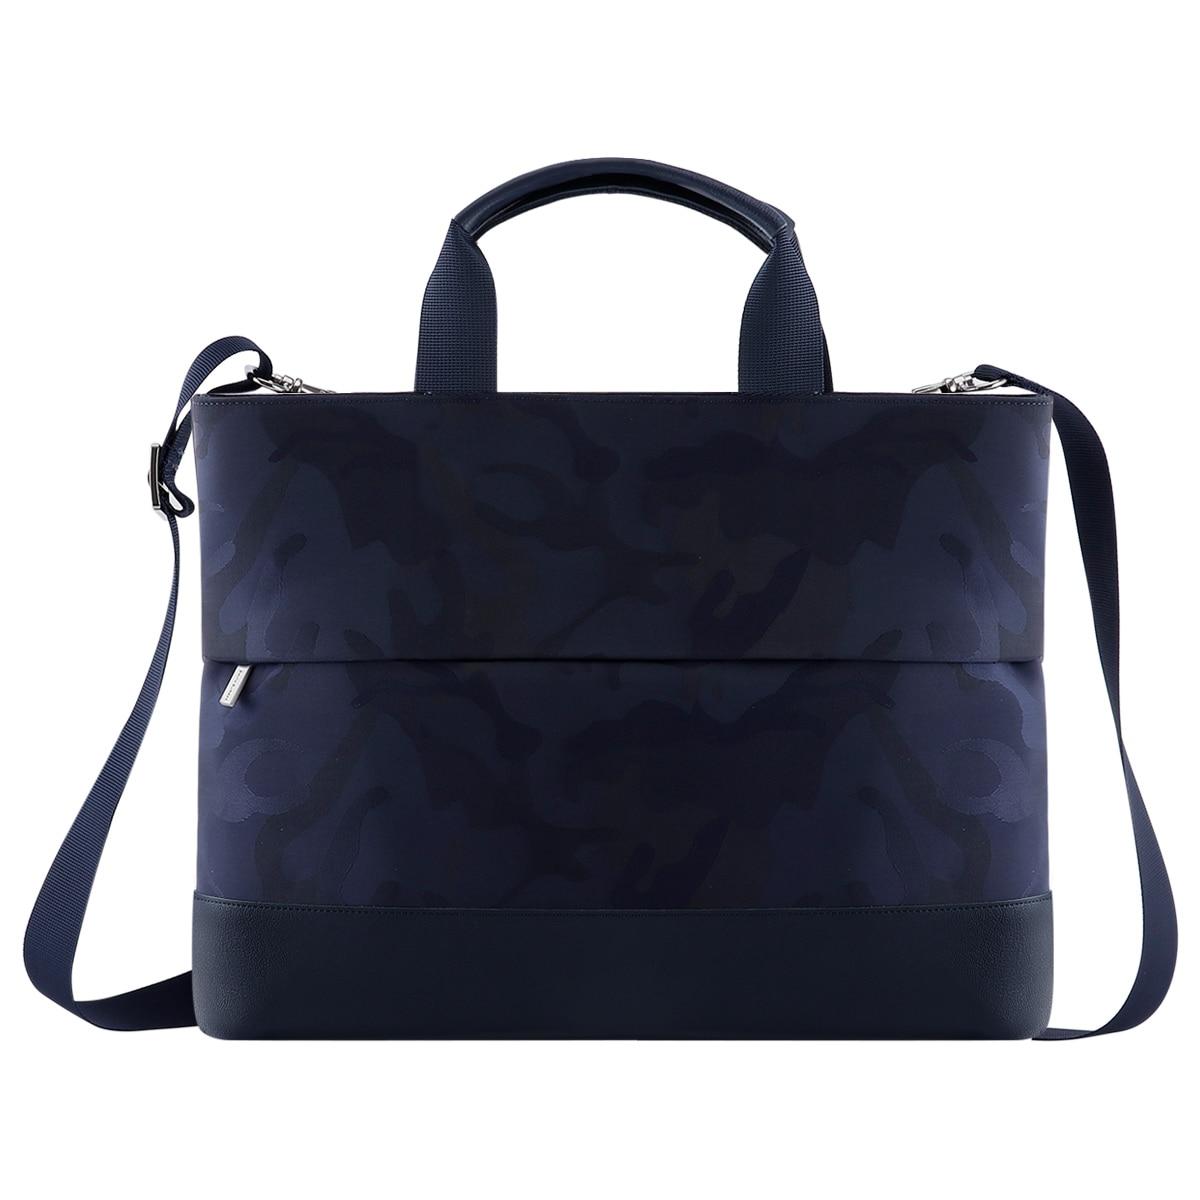 2018 New Business Men Briefcase Loptop Bag case for macbook Pro 13 Man Laptop Hand Bag Shoulder bags for macbook air 13 case